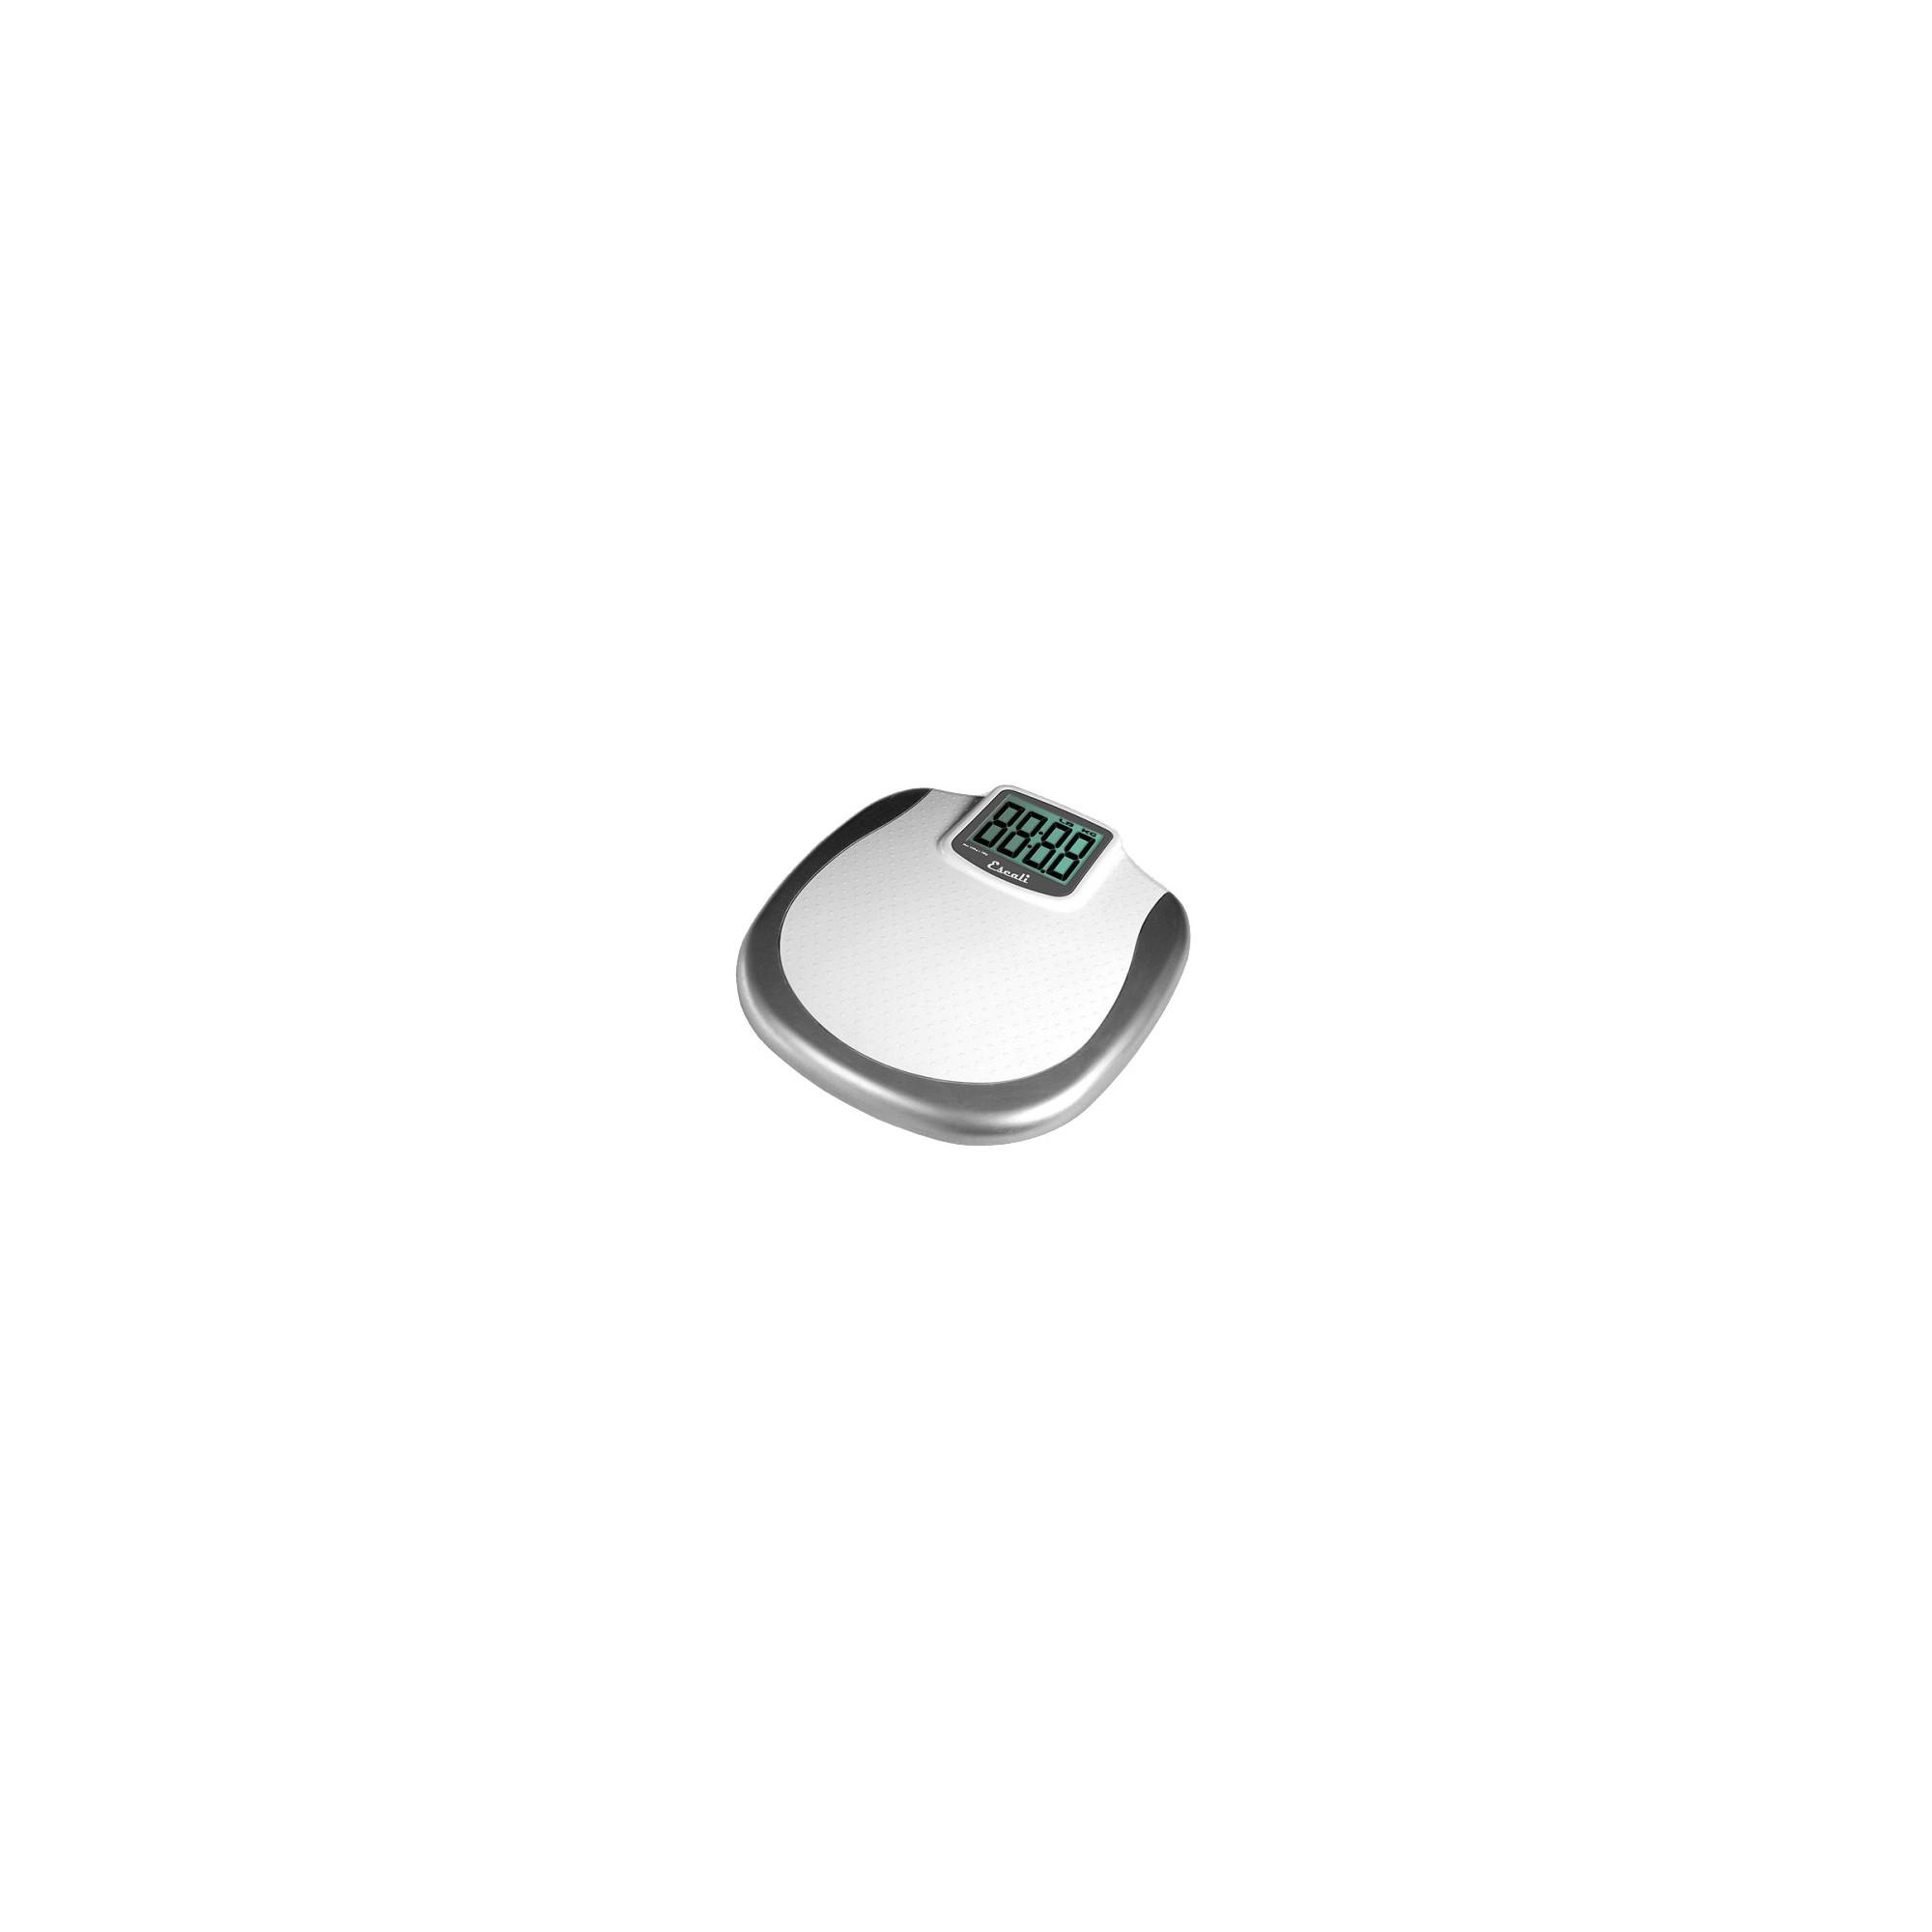 XL Display Bathroom Scale White/Silver - Escali